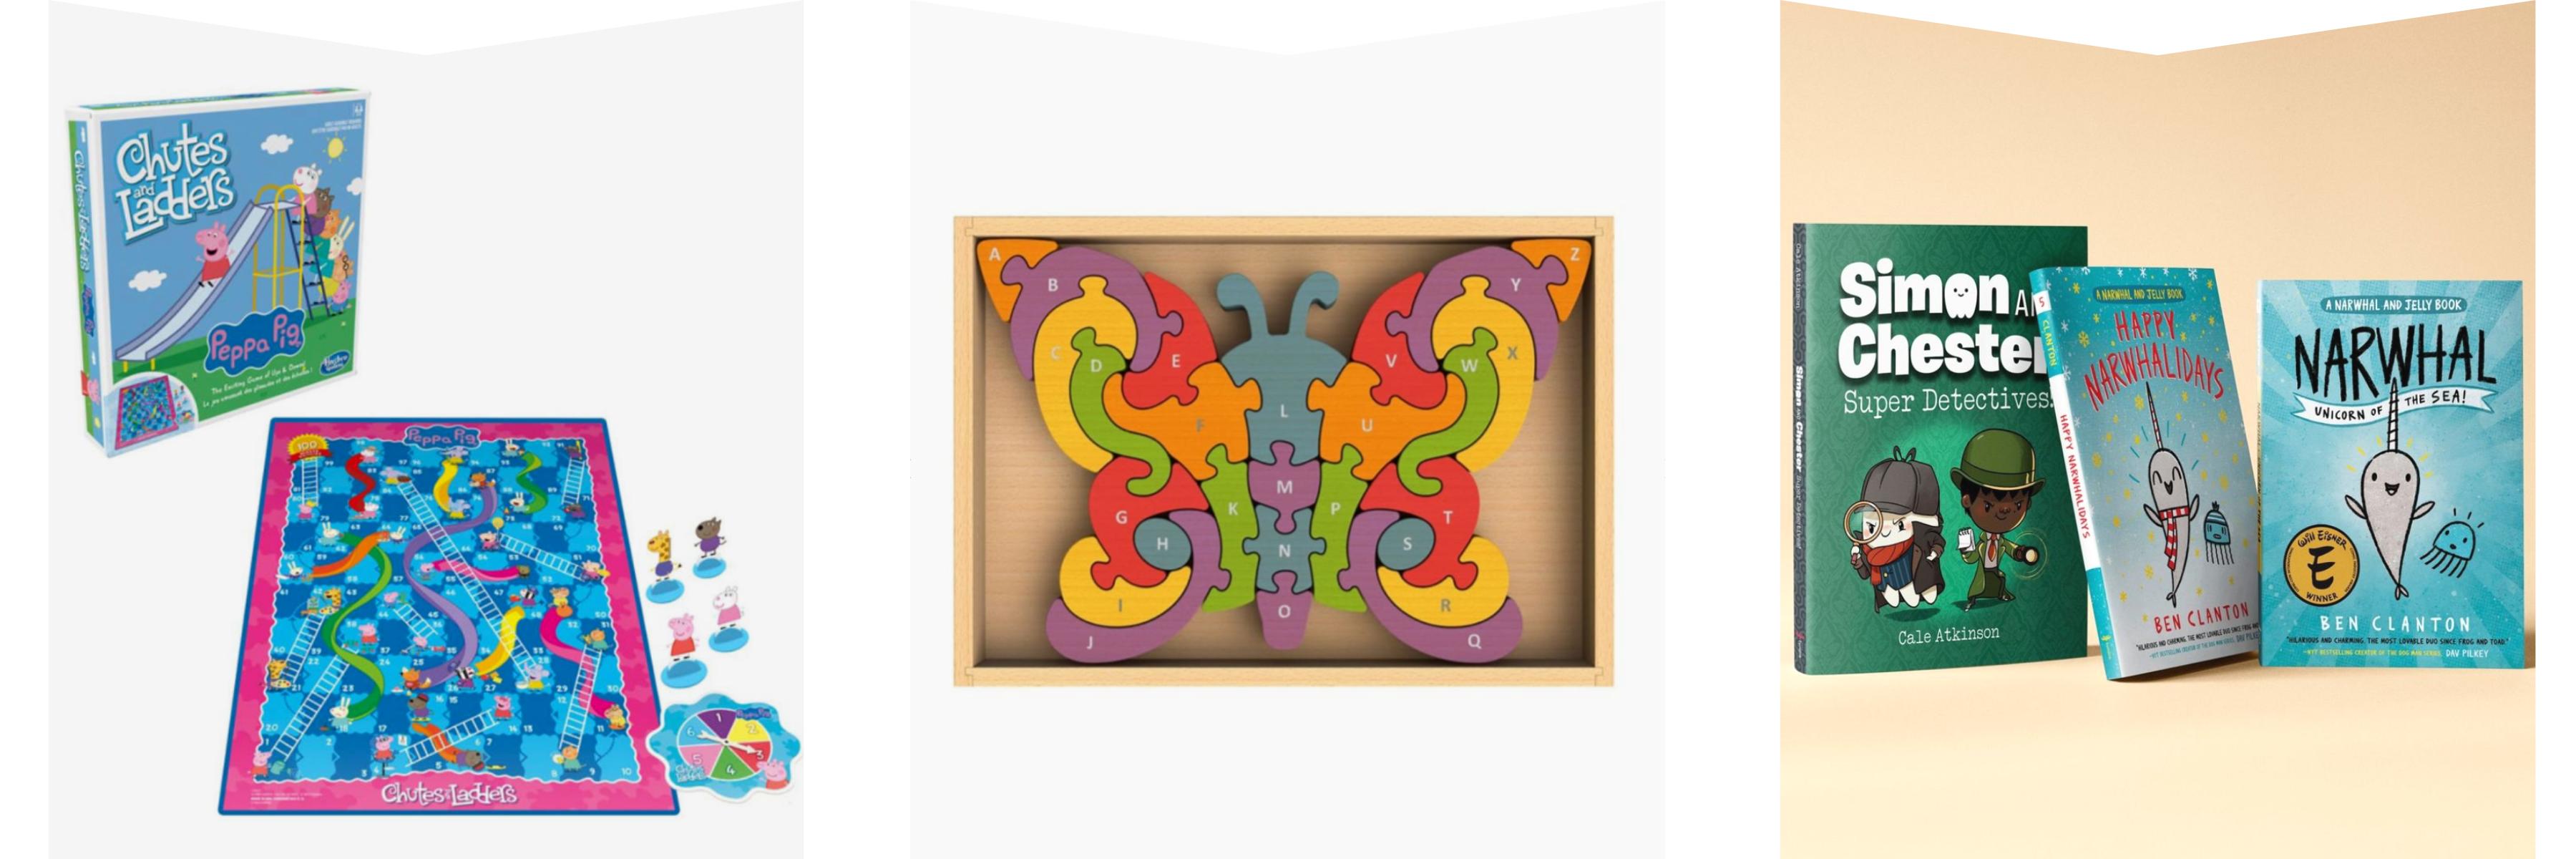 Board games, wooden puzzle & children's books